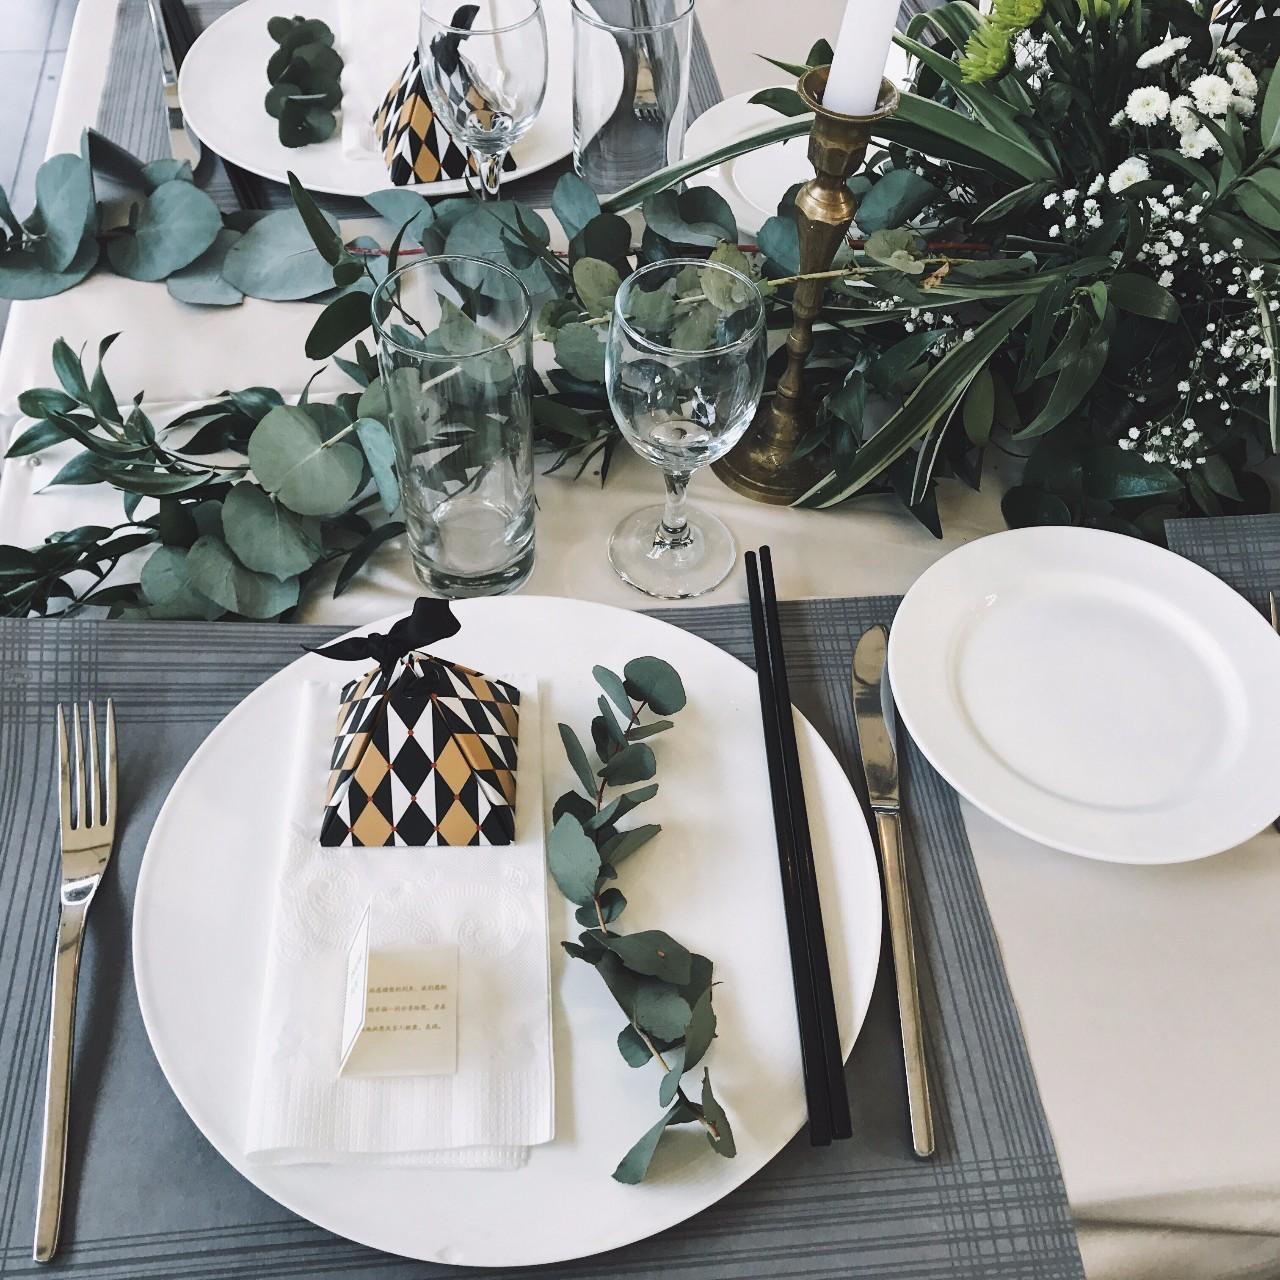 instagram拍照框 提醒大家一下,ins头像要选一个跟婚礼季节一样的啊图片